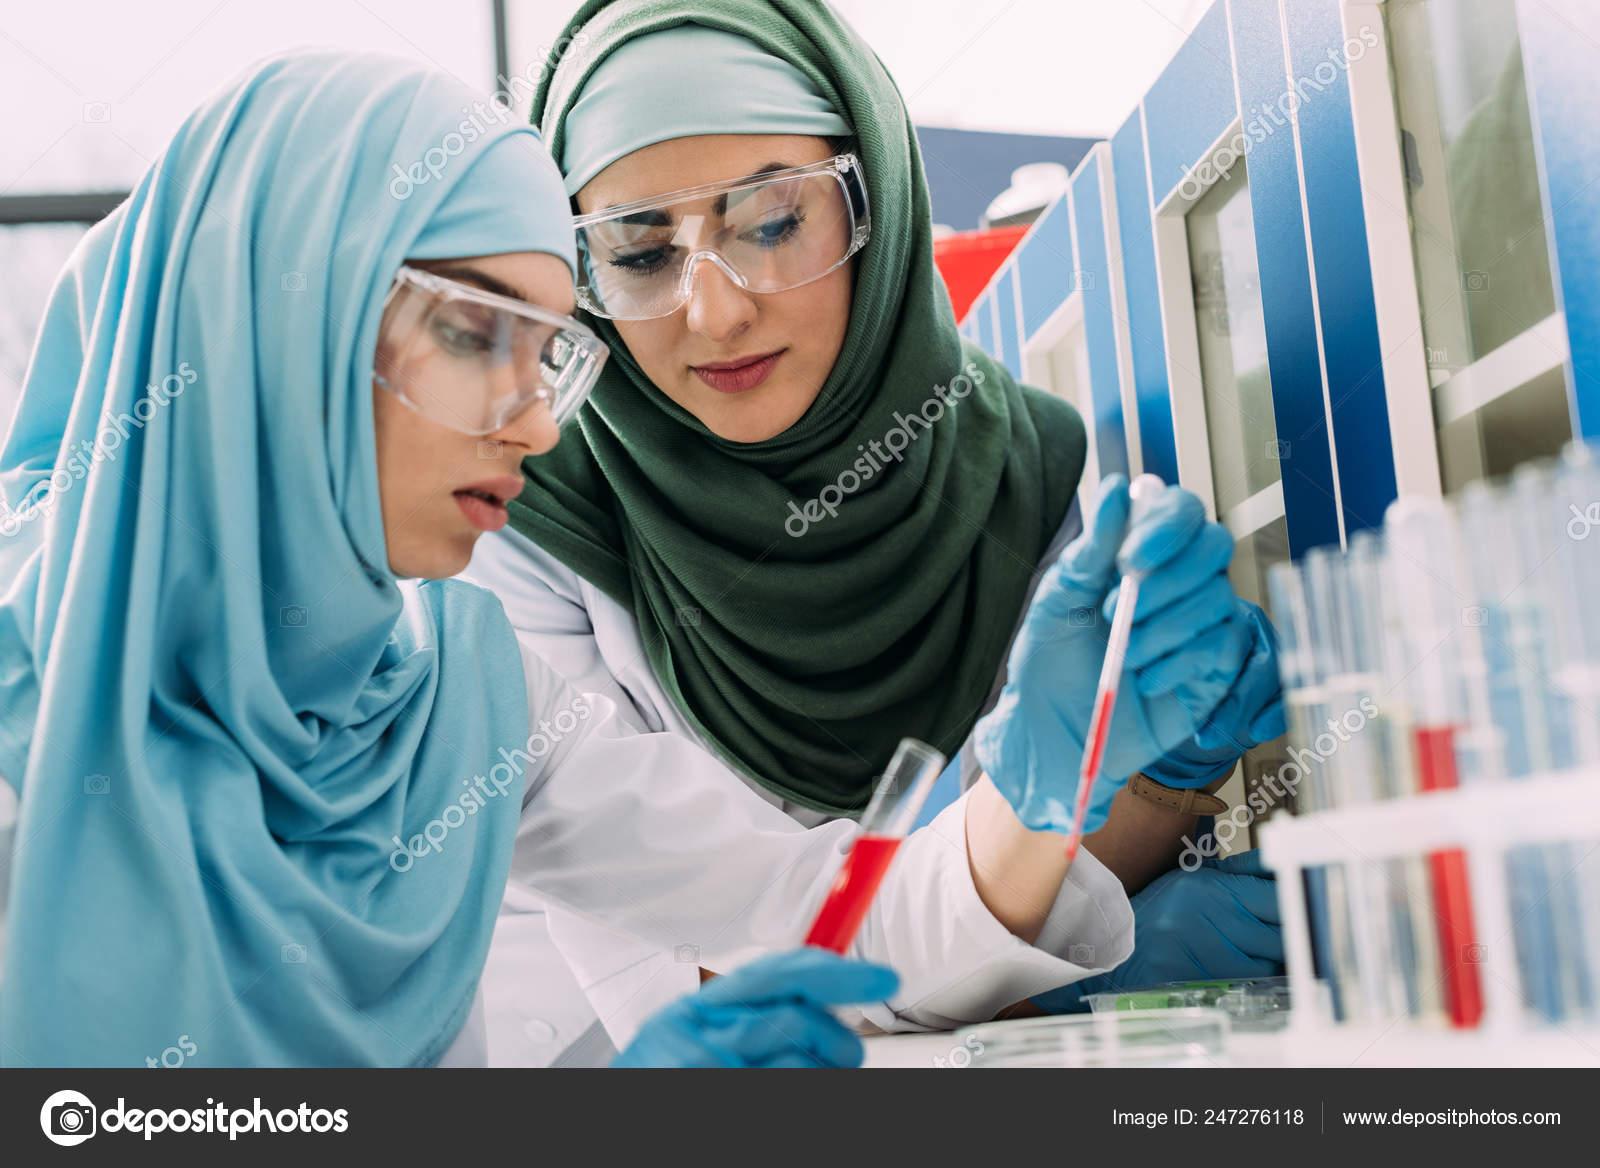 e3f7c25f1e Θηλυκό Μουσουλμάνων Επιστημόνων Προστατευτικά Γυαλιά Σιφώνιο Και  Δοκιμαστικό Σωλήνα Κατά — Φωτογραφία Αρχείου